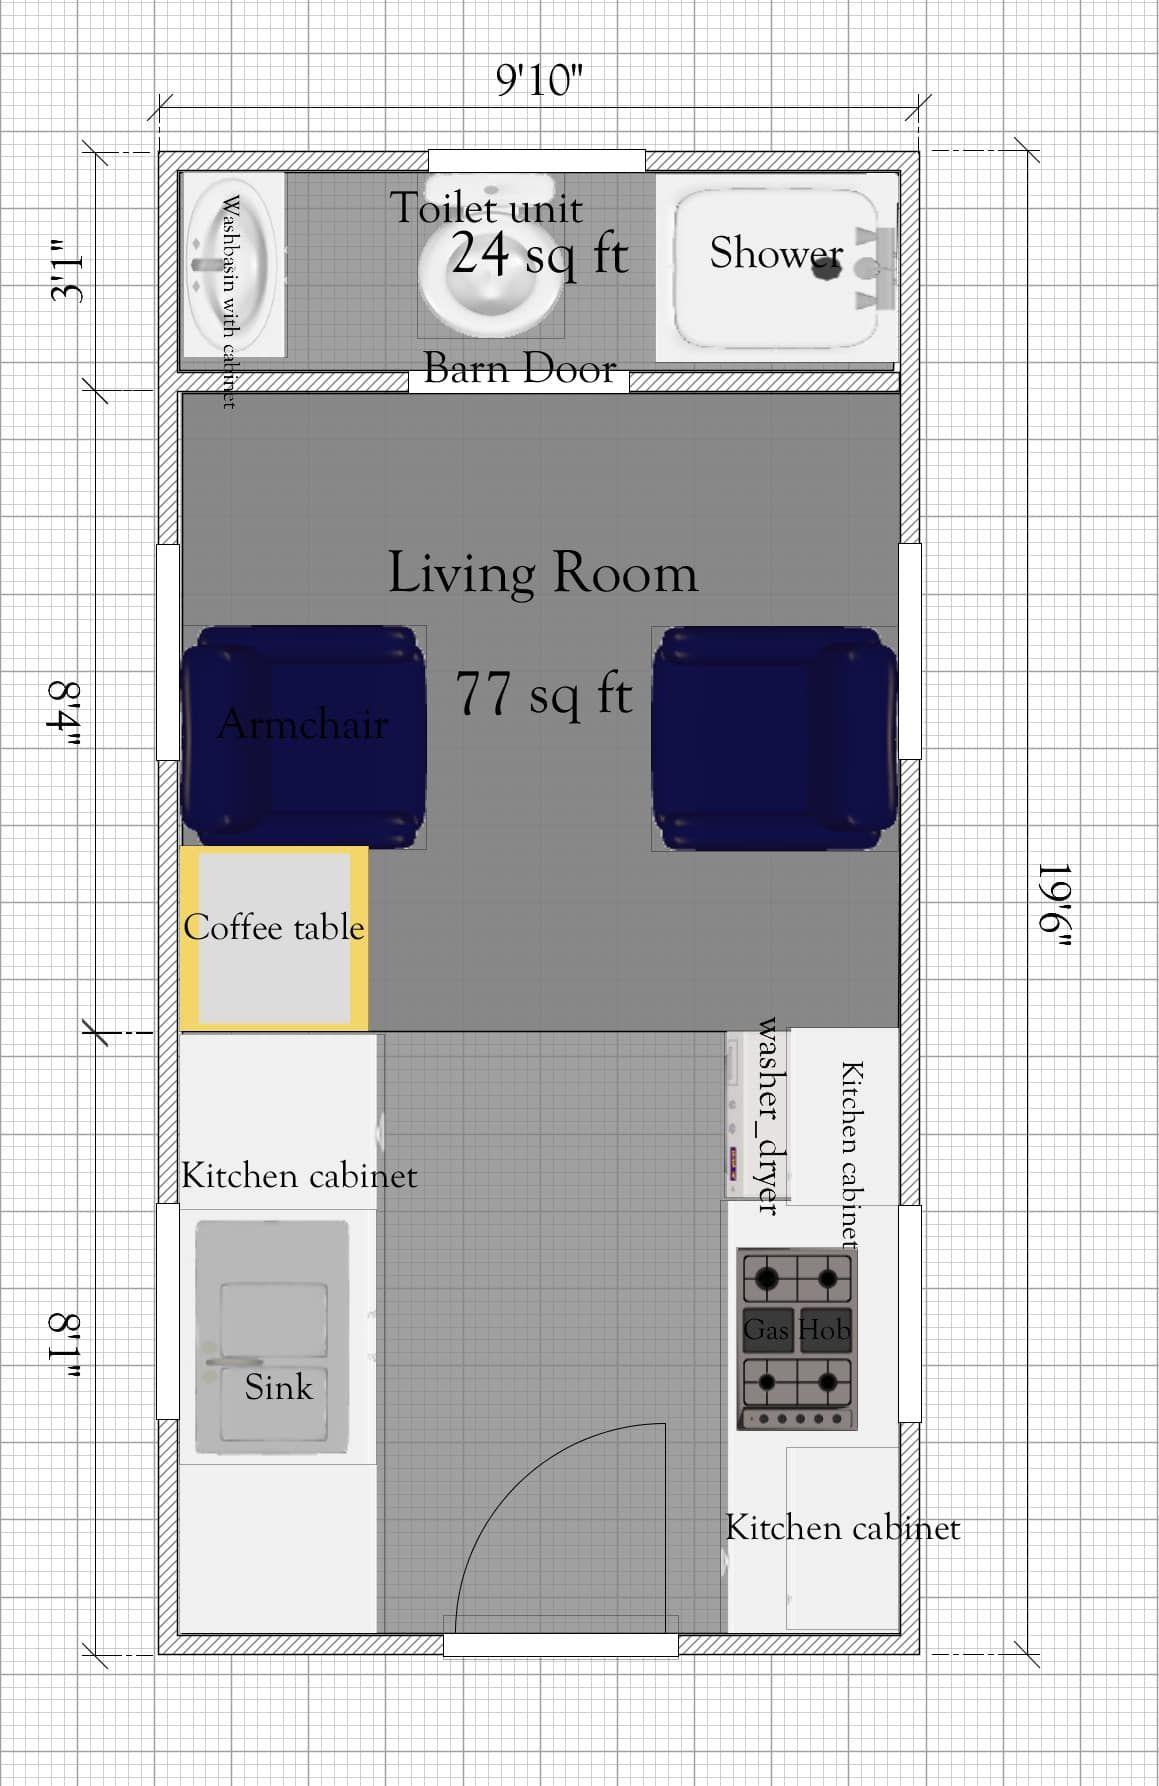 Tiny House Under 400 Sq Ft In 2020 Tiny House Floor Plans Tiny House Plans Free Small Kitchen Floor Plans